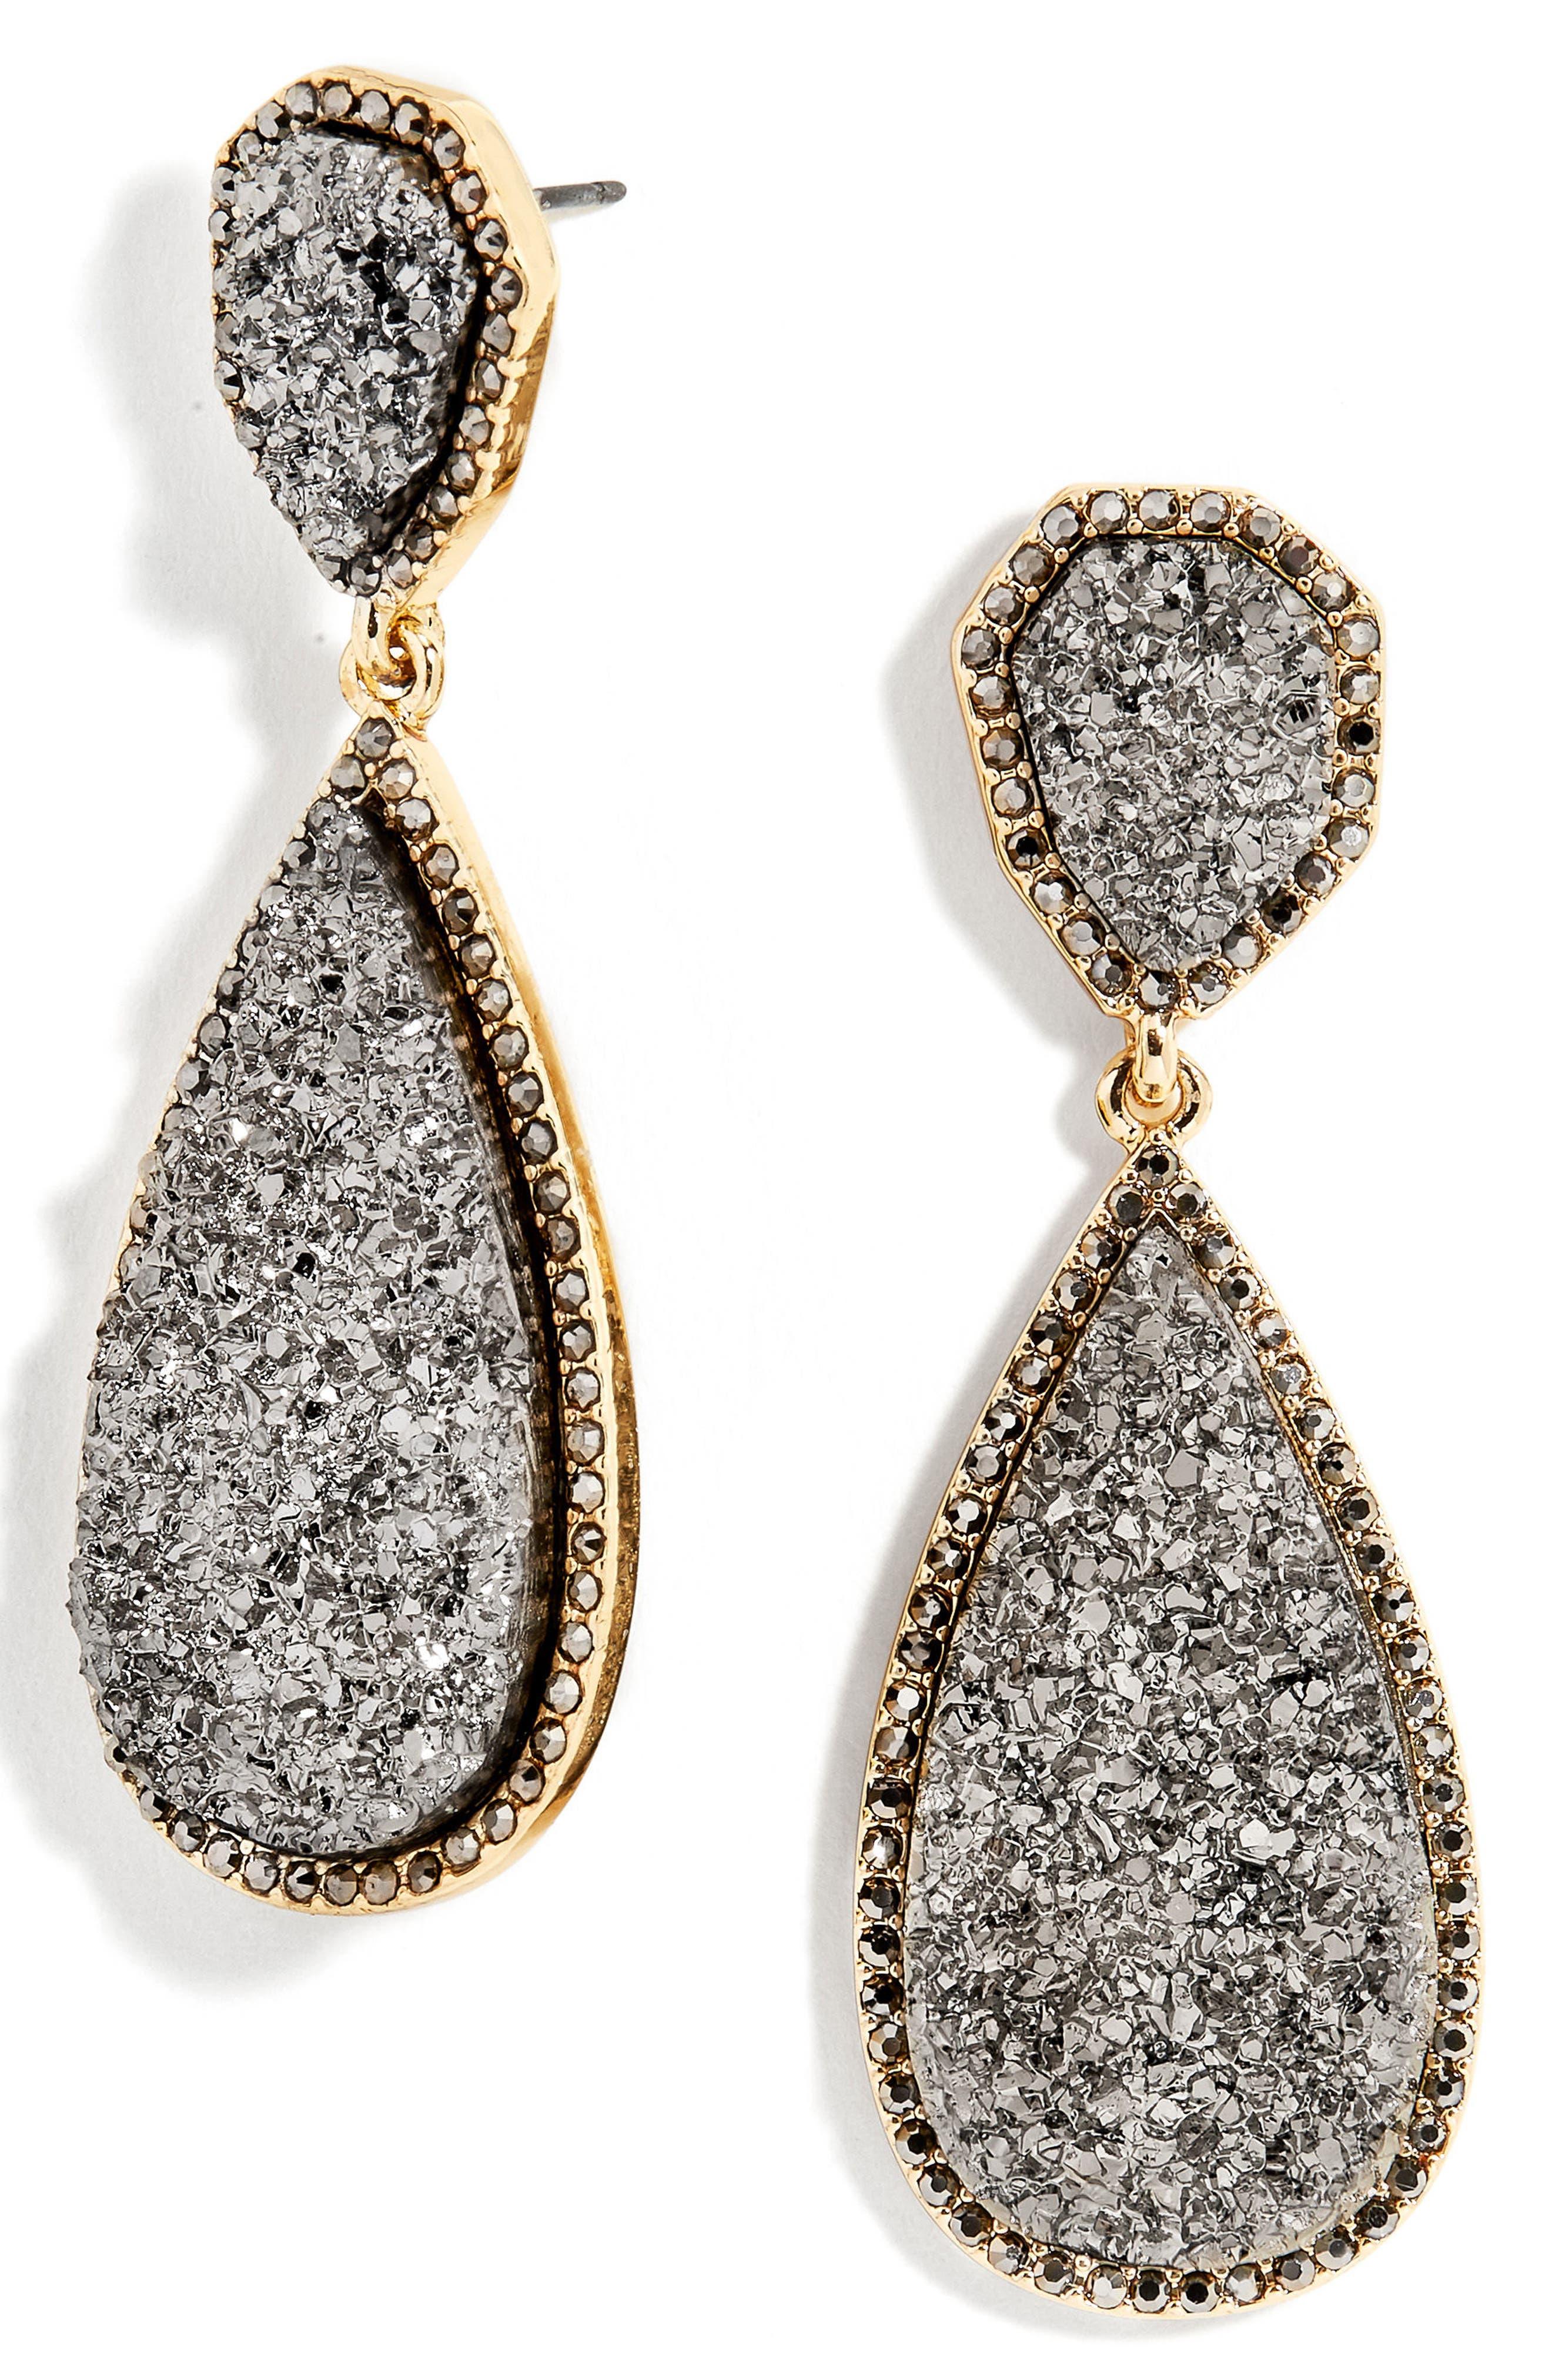 Main Image - BaubleBar Moonlight Drop Earrings